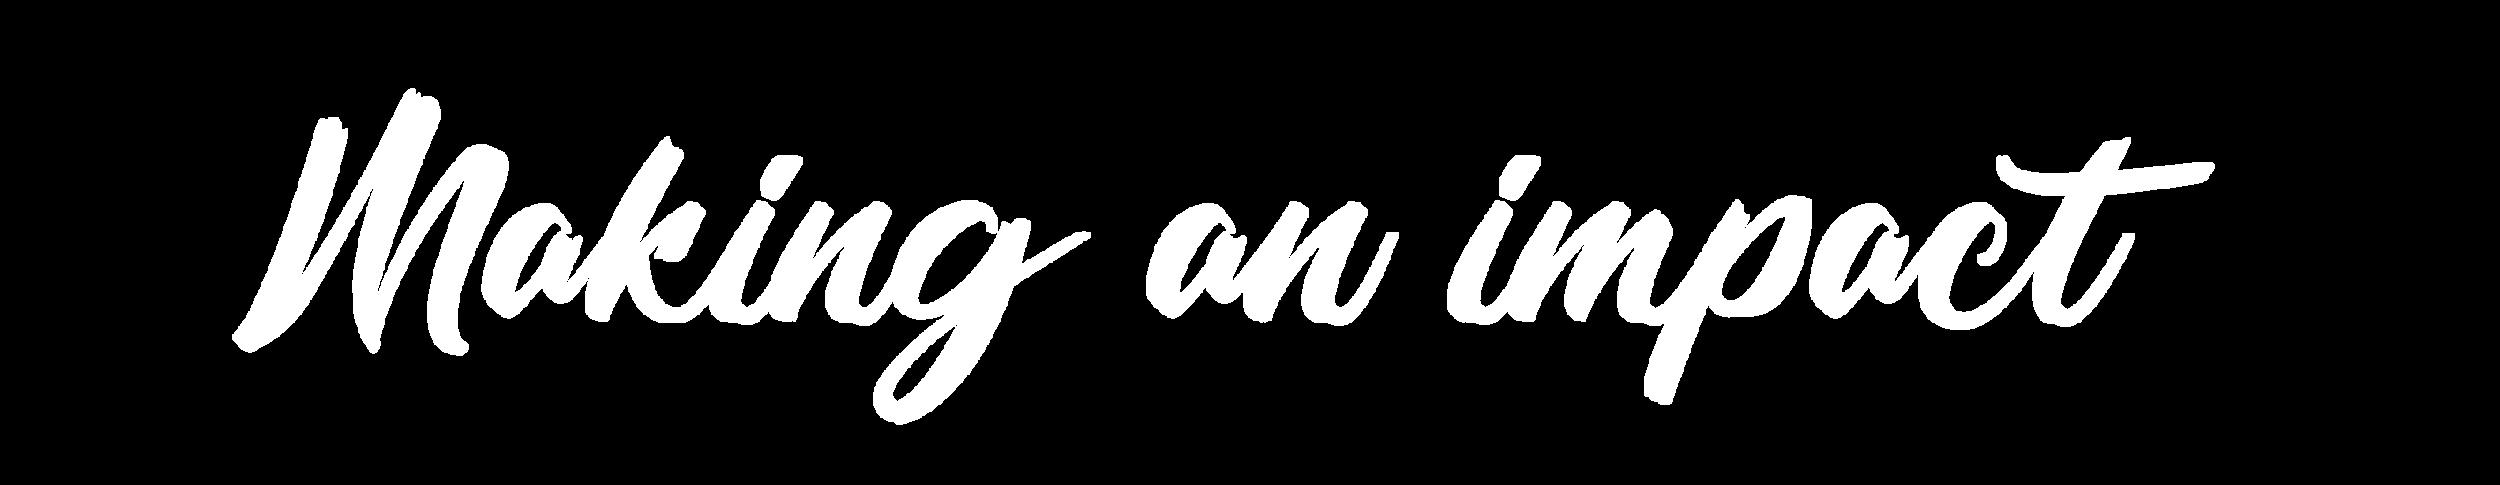 Making_an_impact.png